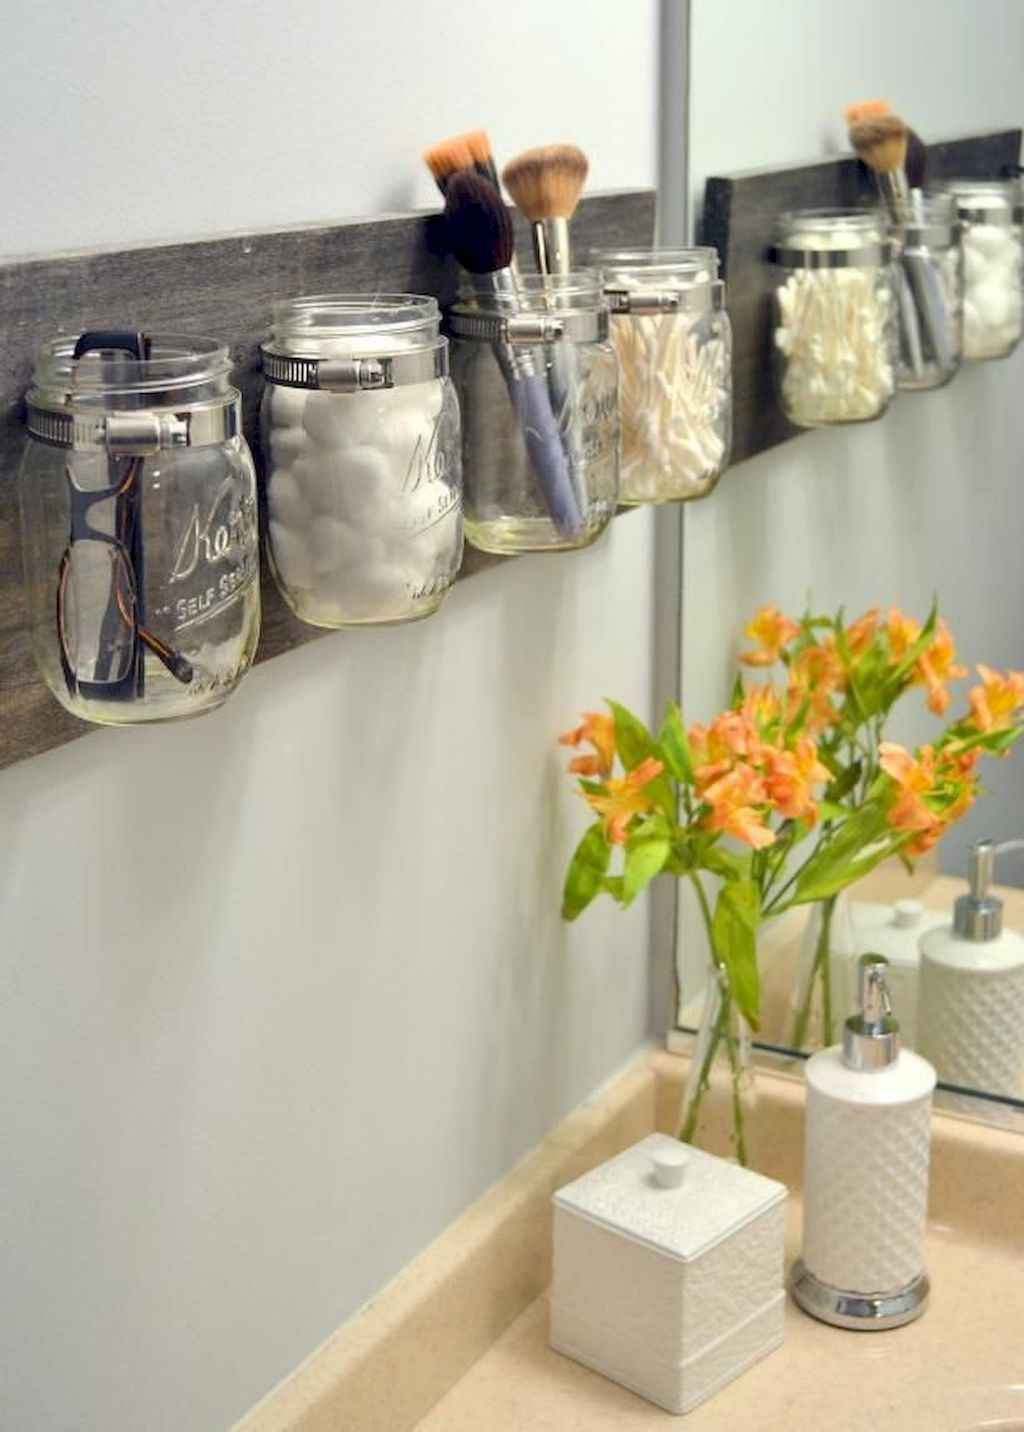 Inspiring apartment bathroom remodel ideas on a budget (27)